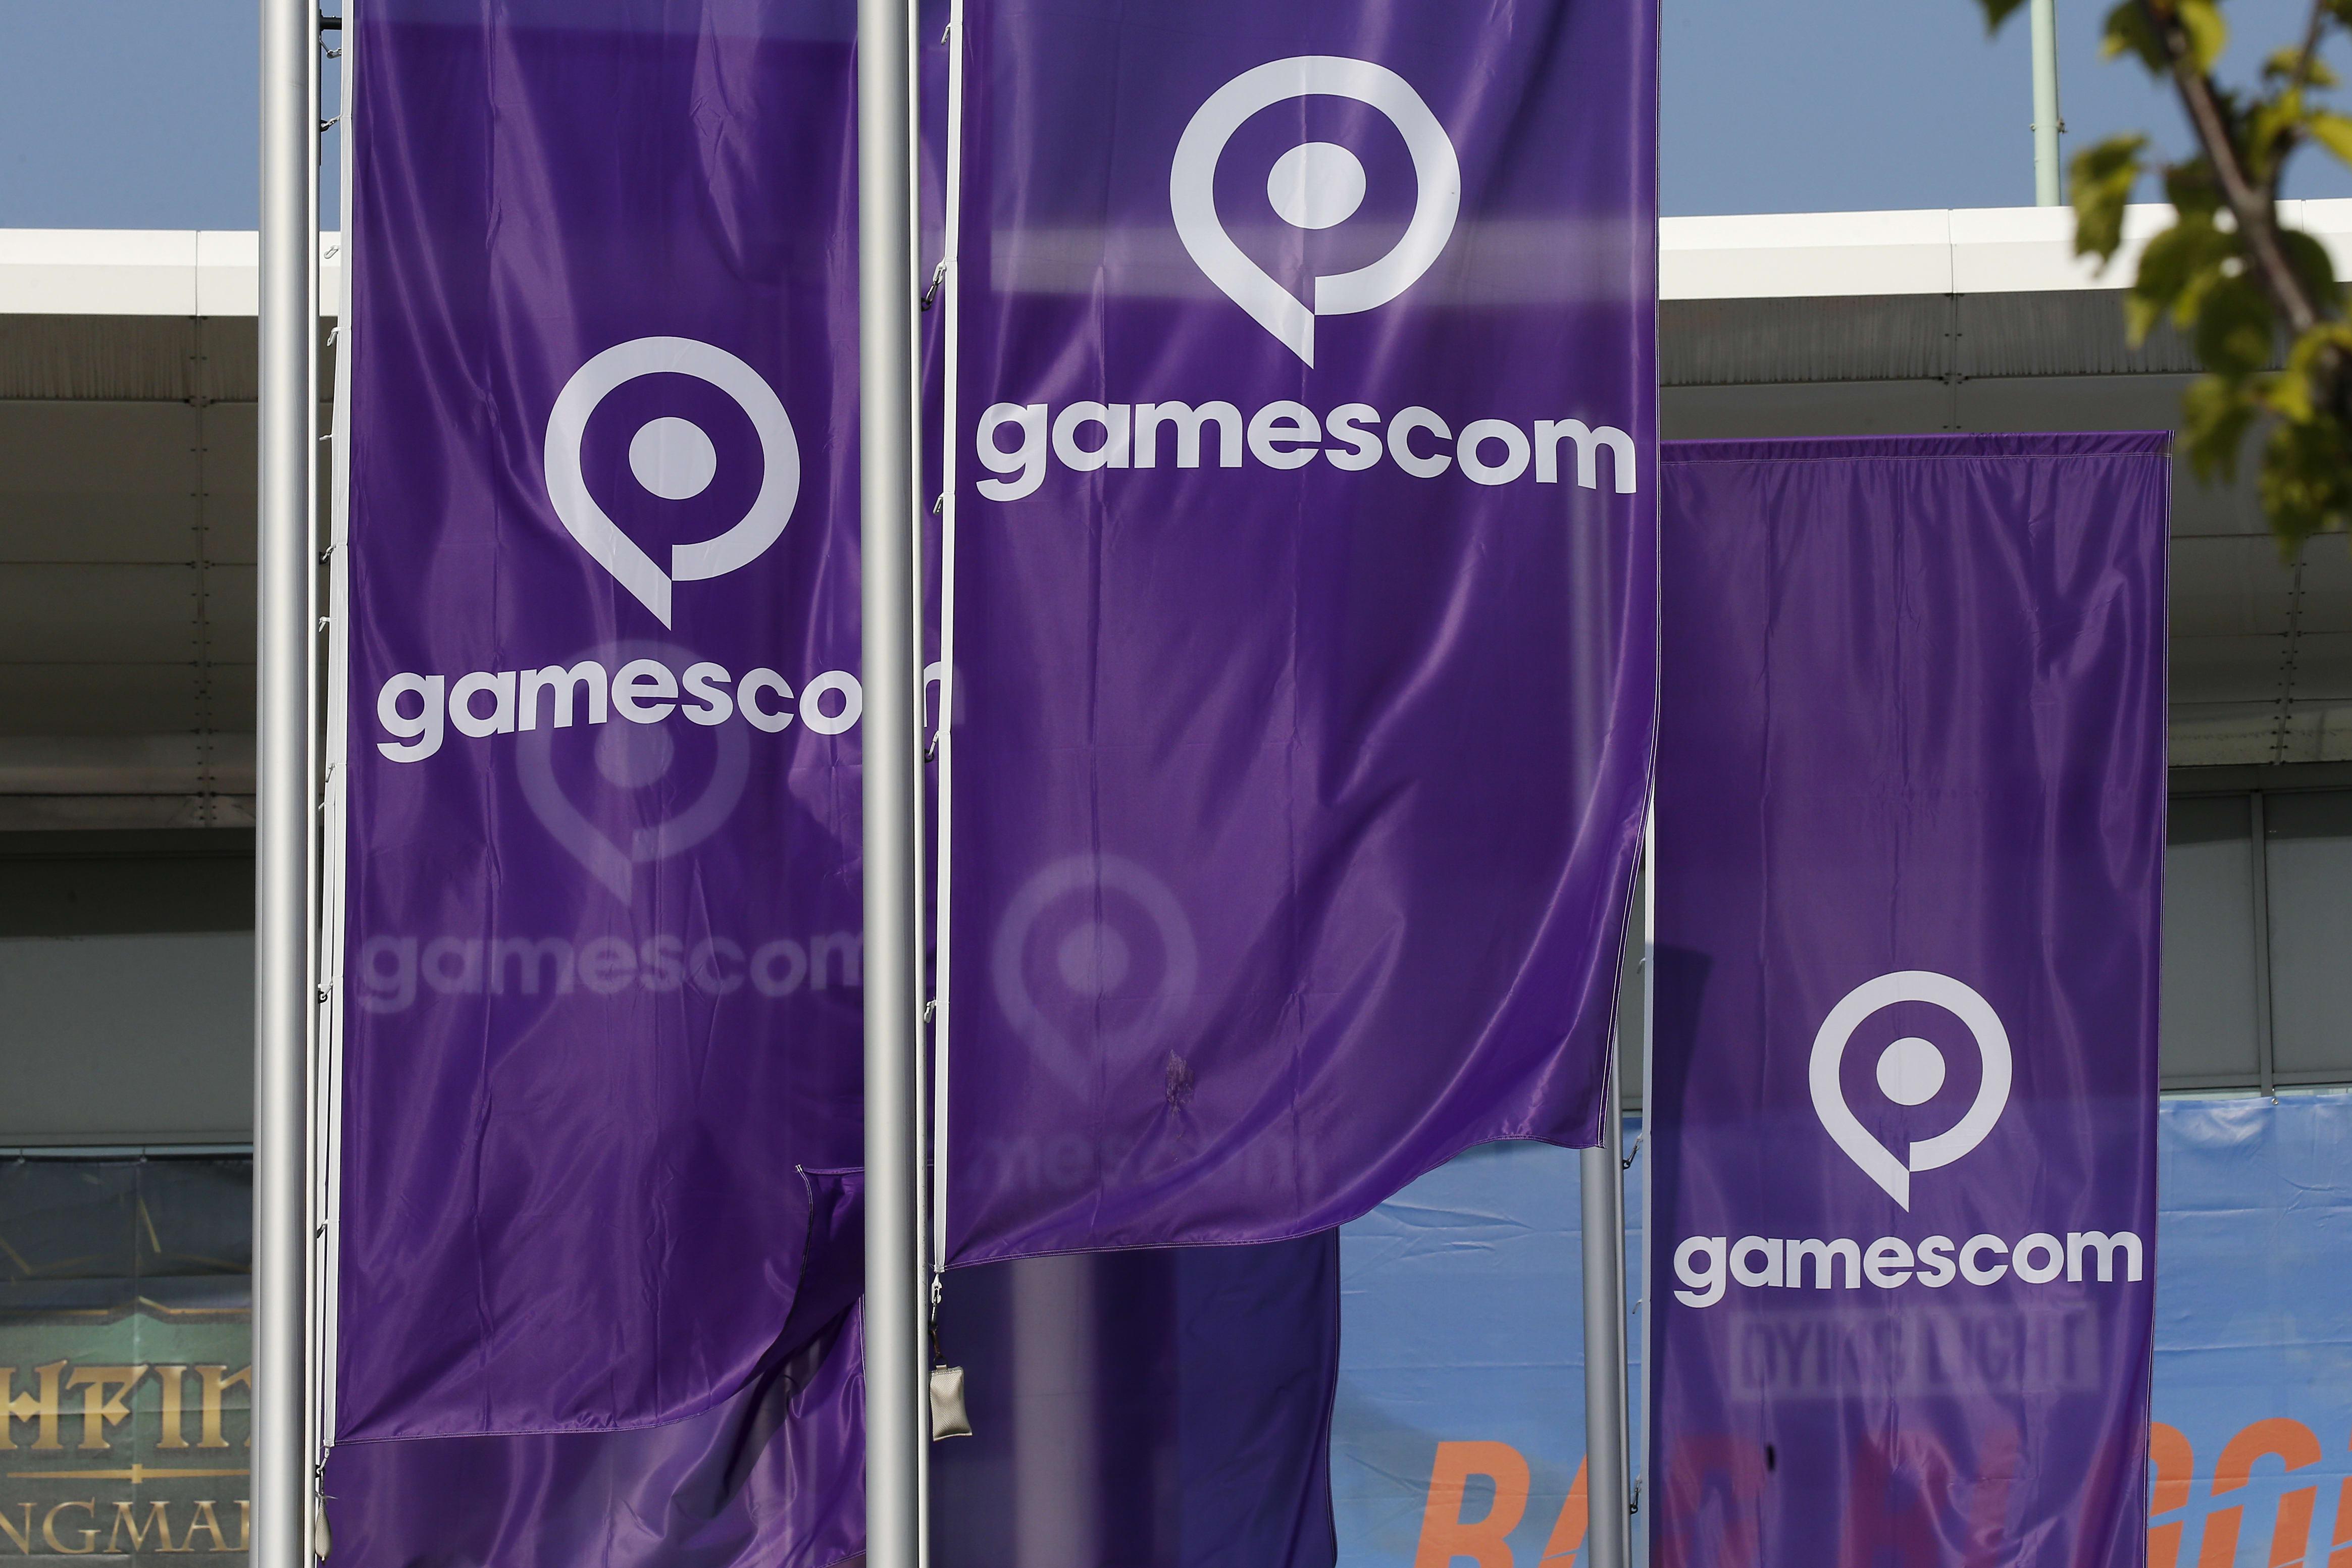 Gamescom banners